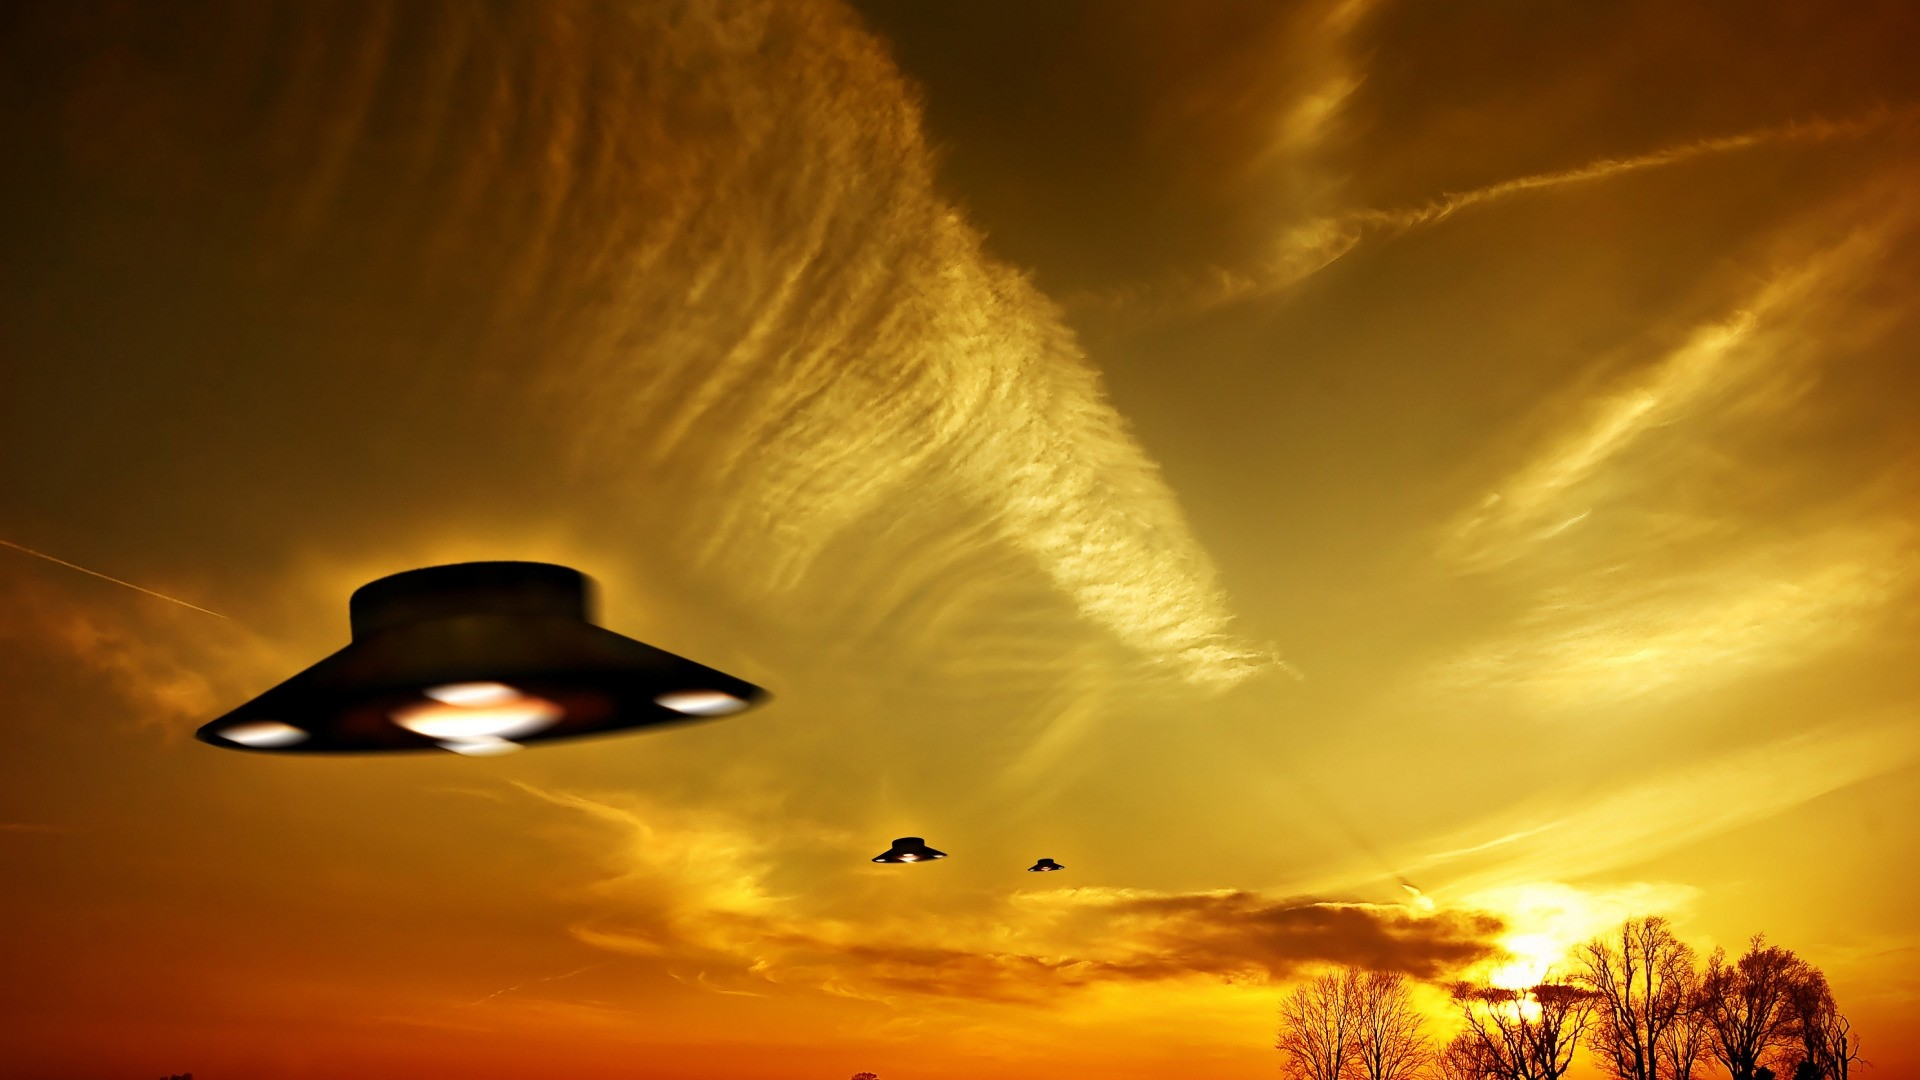 Ufo hd wallpaper download